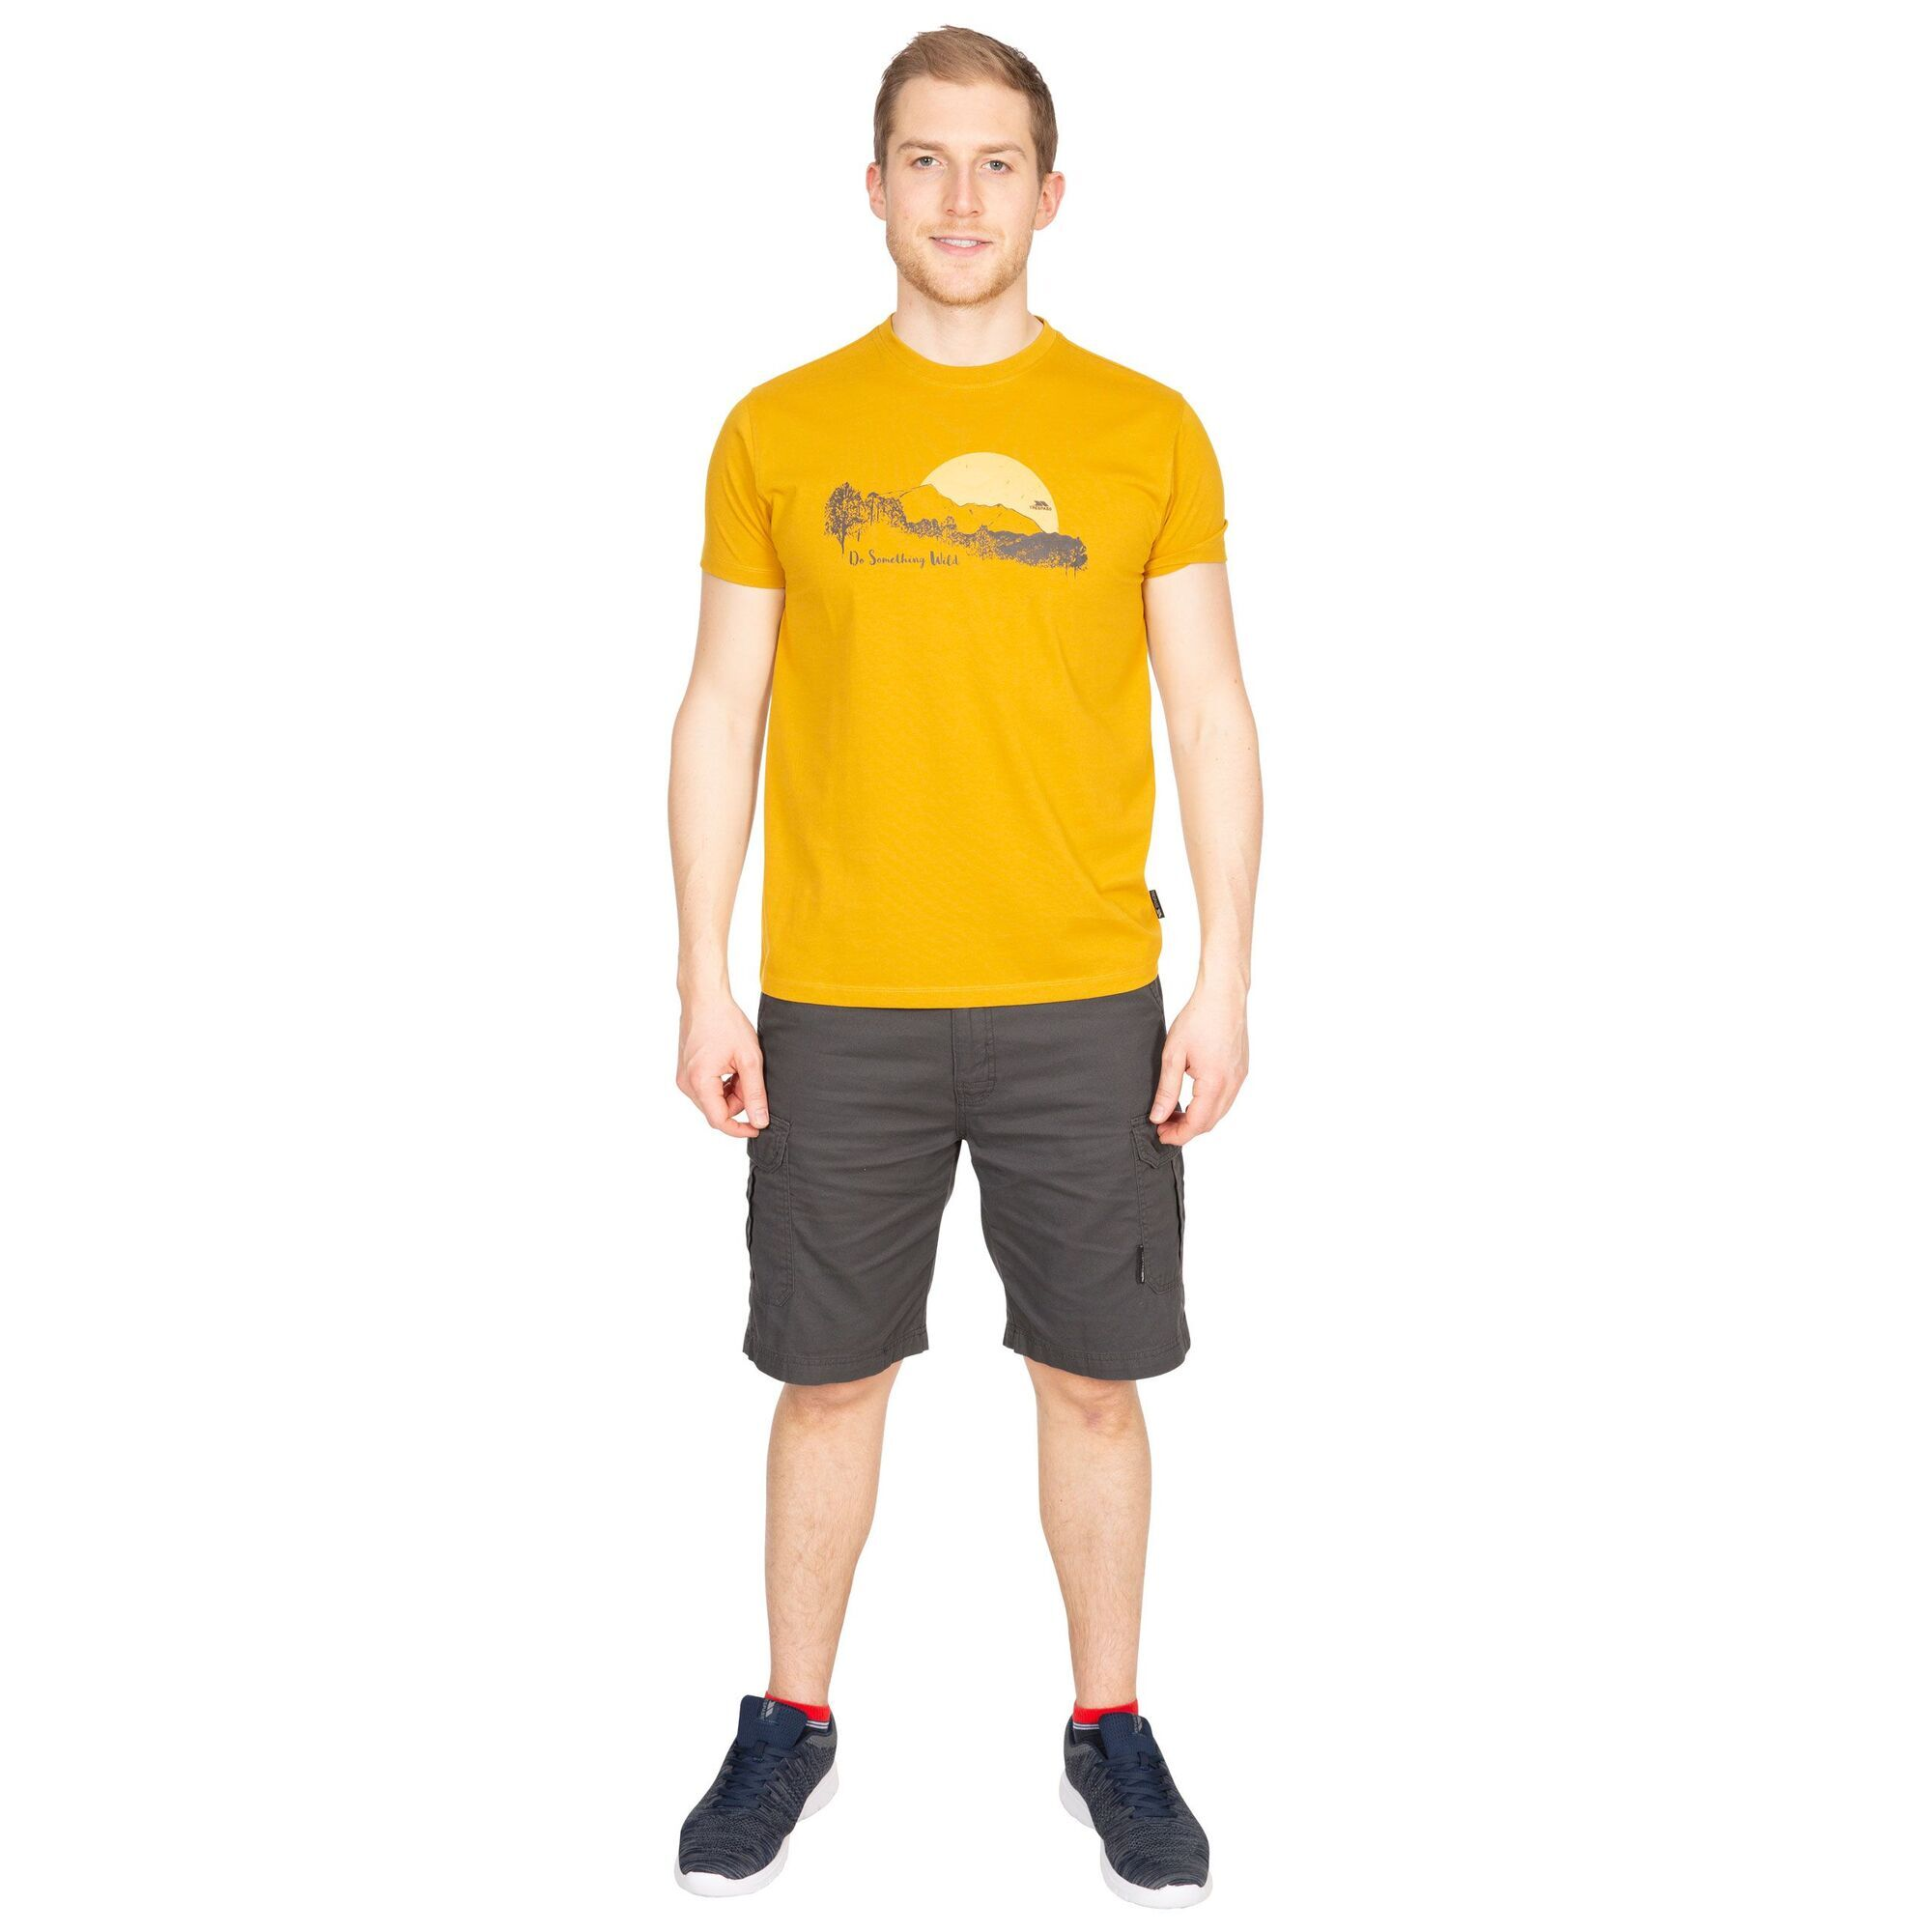 TP4969 Trespass Mens Bredonton T-Shirt